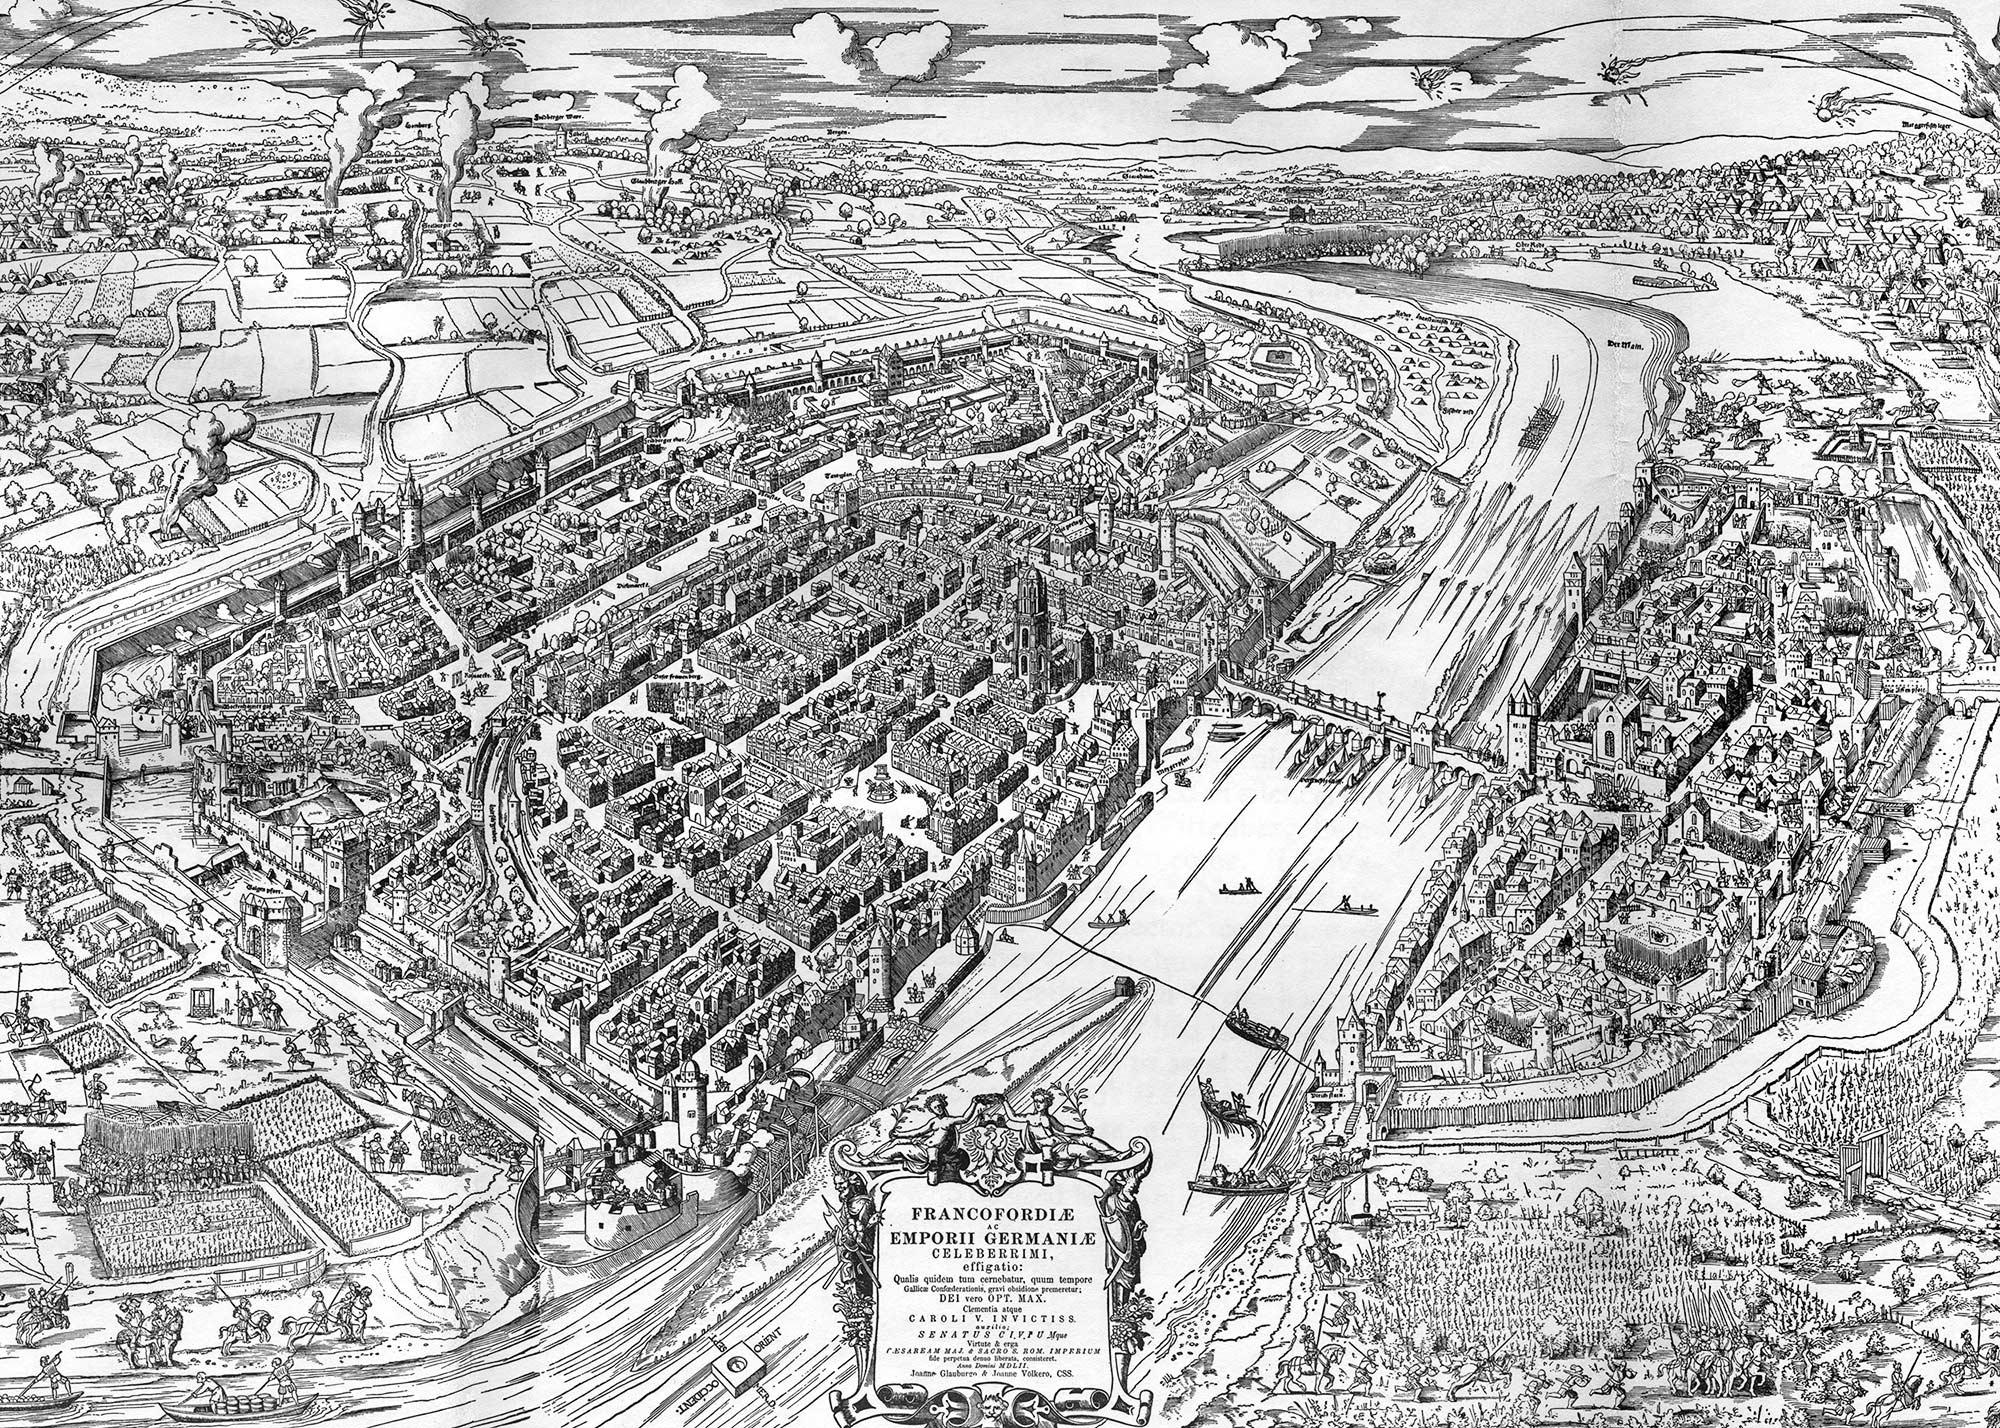 Frankfurter Stadtbefestigung im Mittelalter - Stadtmauer Frankfurt